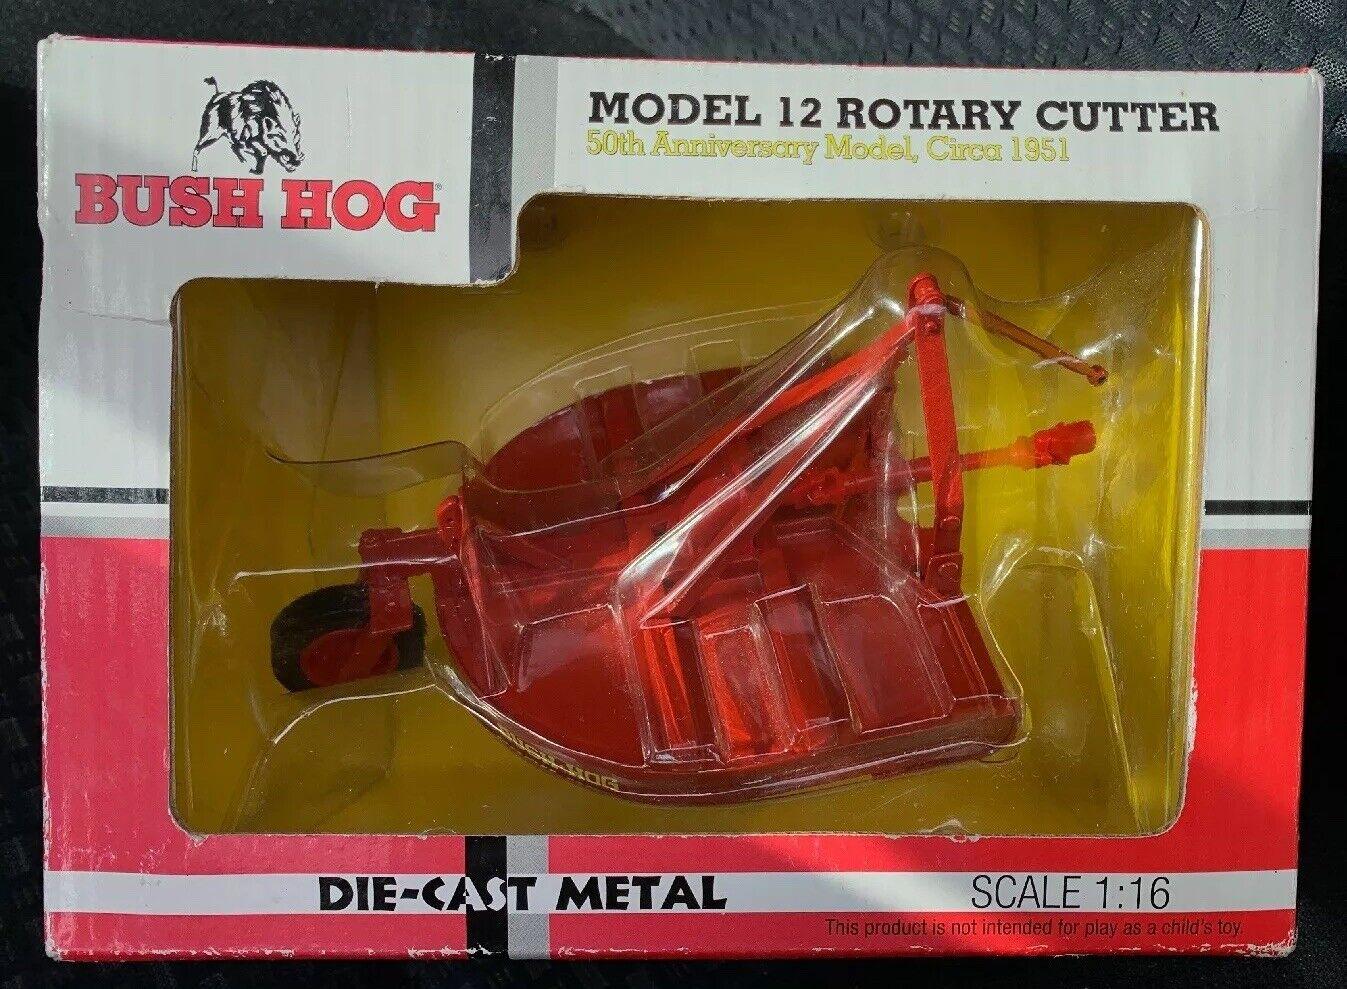 ERTL Bush Hog modèle 12 rougeary Cutter 50th Anniv, circa 1951 Die-Cast No. 91586